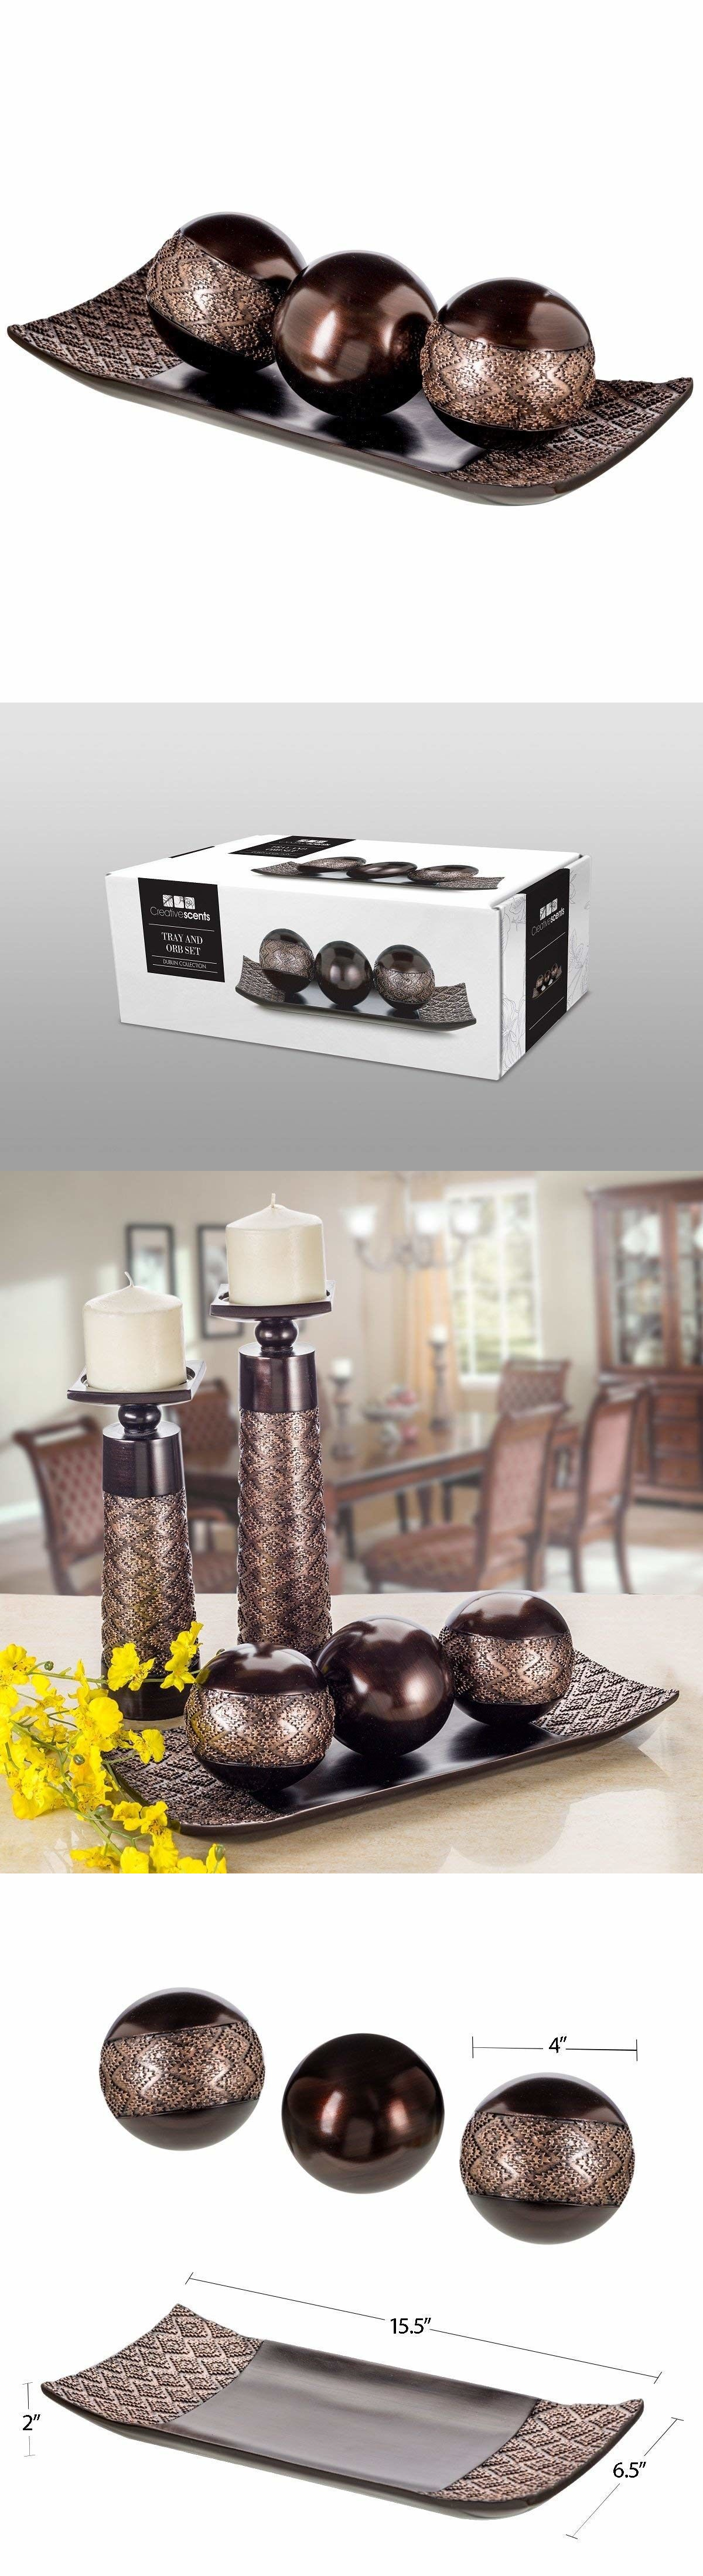 dublin decorative tray and orbs balls